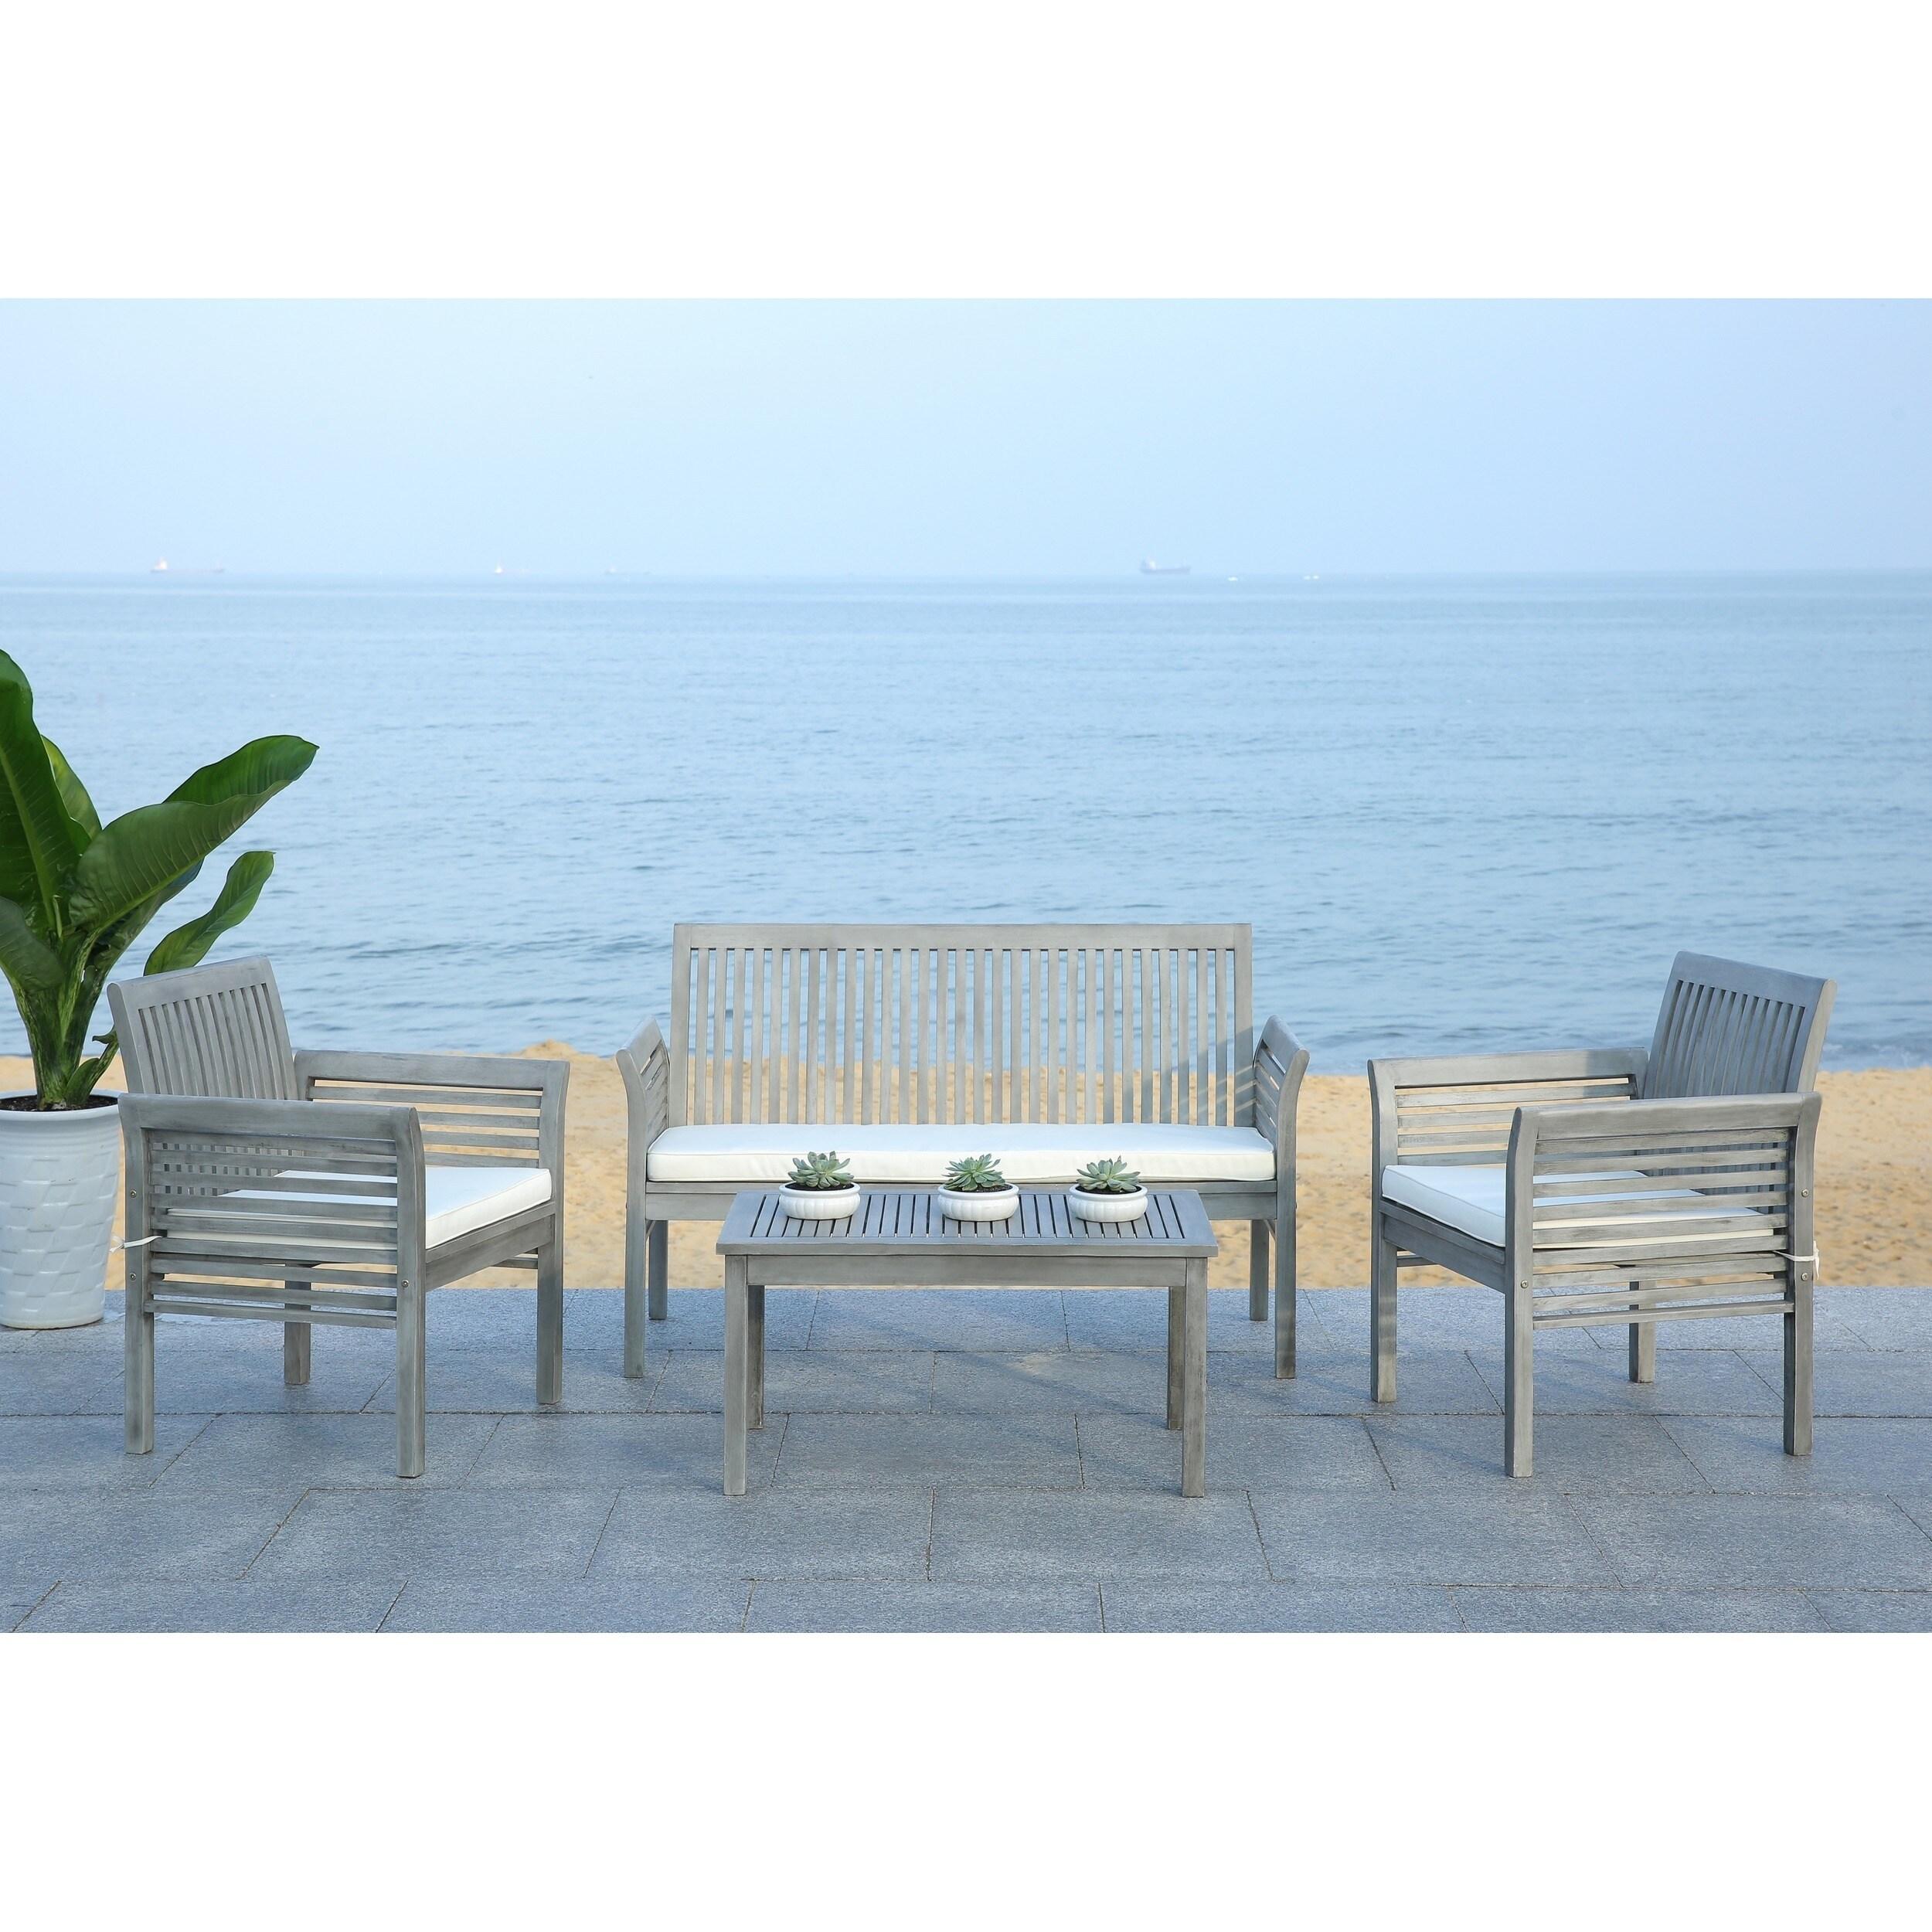 Safavieh Carson Grey Wash Acacia Wood 4-piece Outdoor Furniture Set Shop